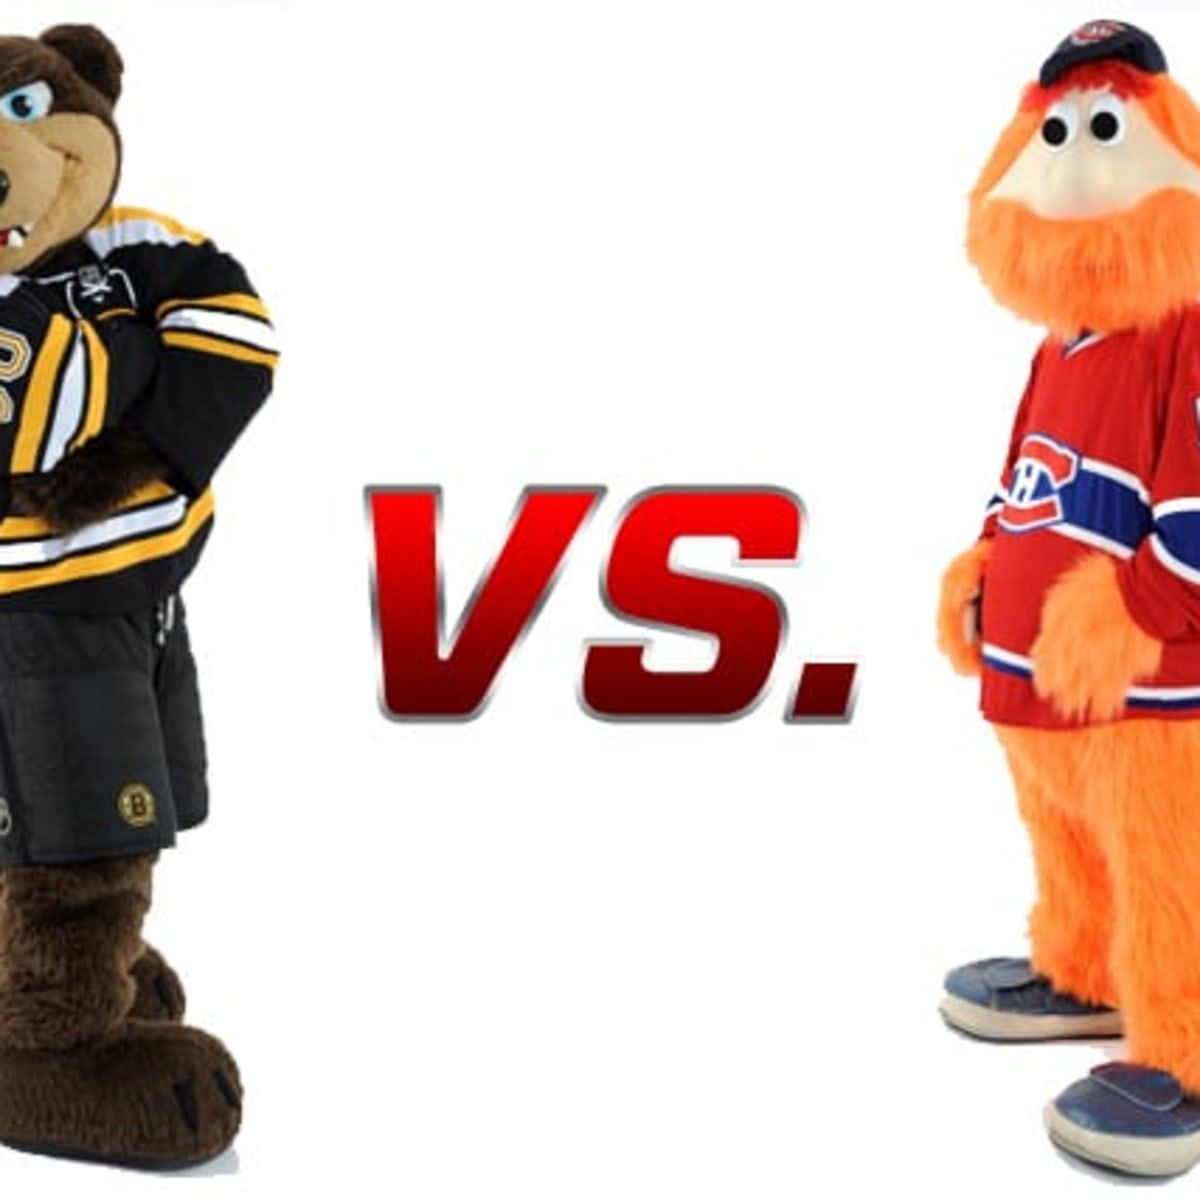 Boston Bruins Vs Montreal Canadiens Mascot Showdown The Hockey News On Sports Illustrated